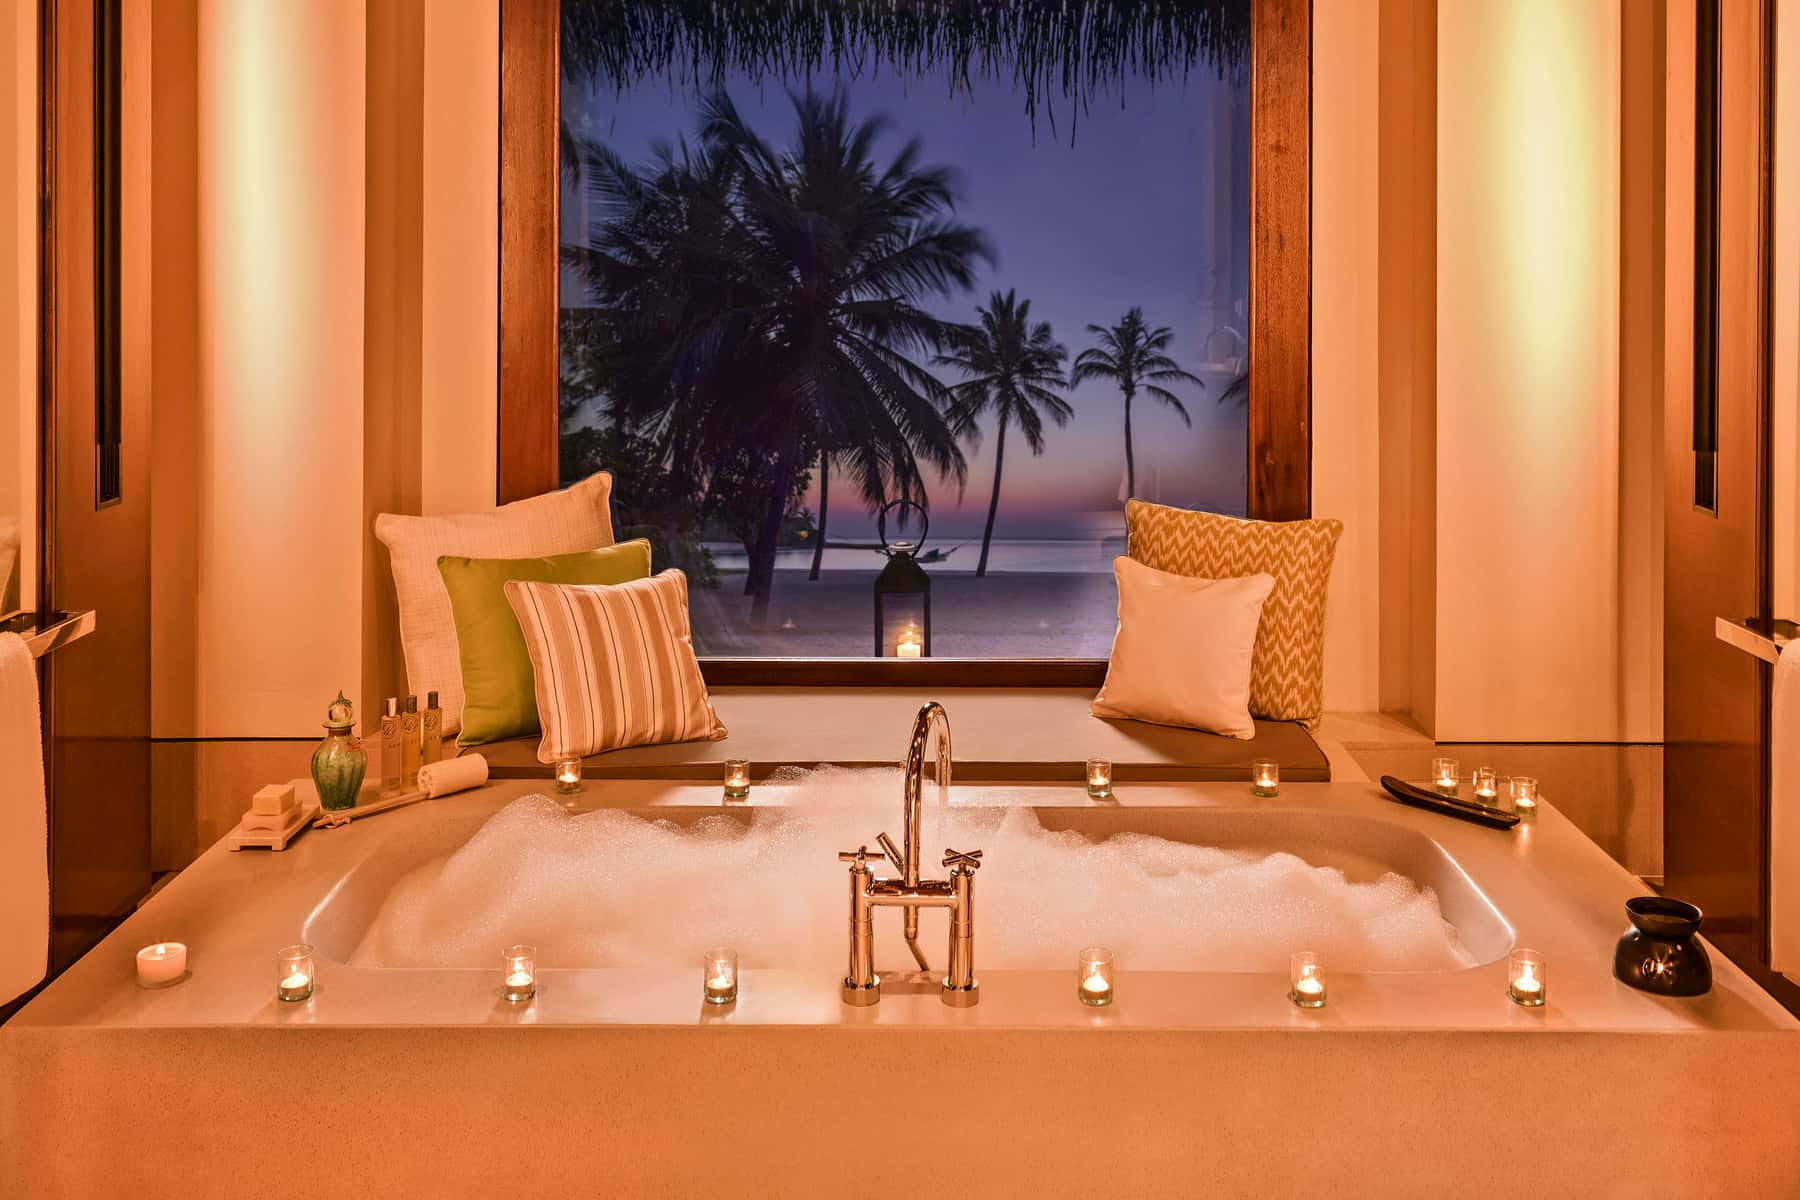 Resort Maldive One & Only Reehi Rah beach villa